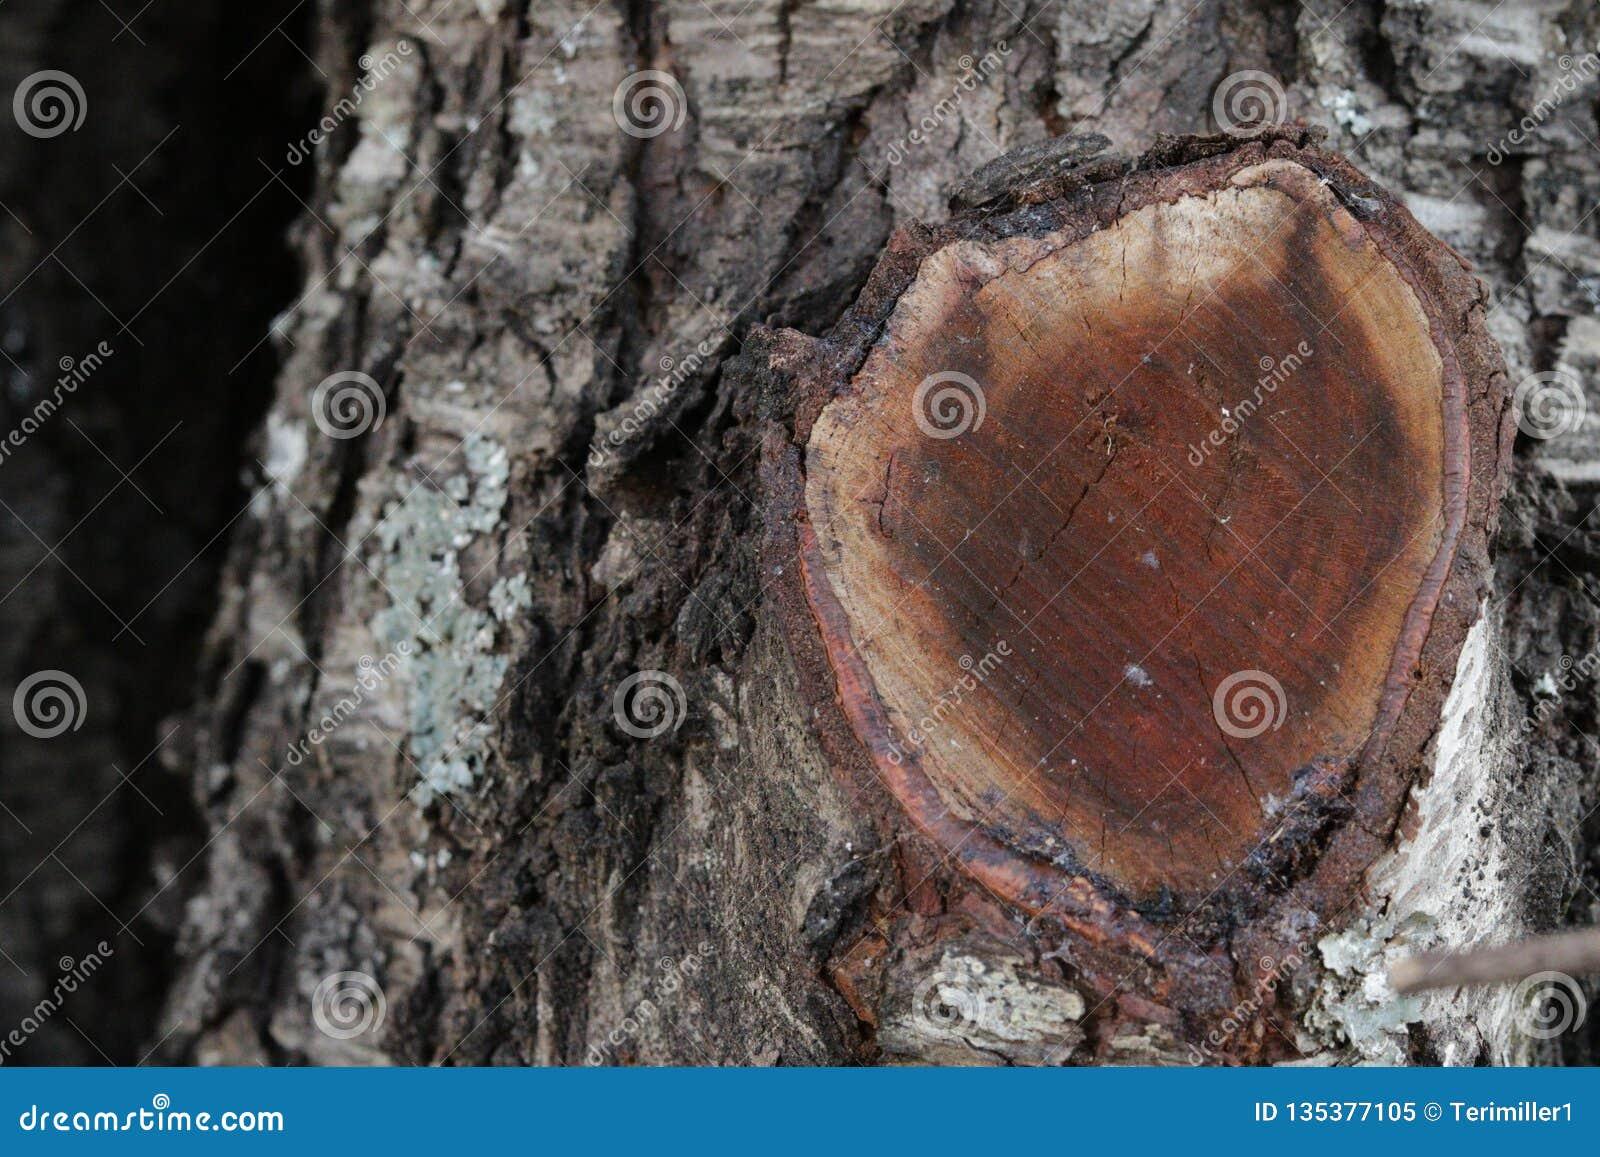 Oak tree rough bark with a cut limb.